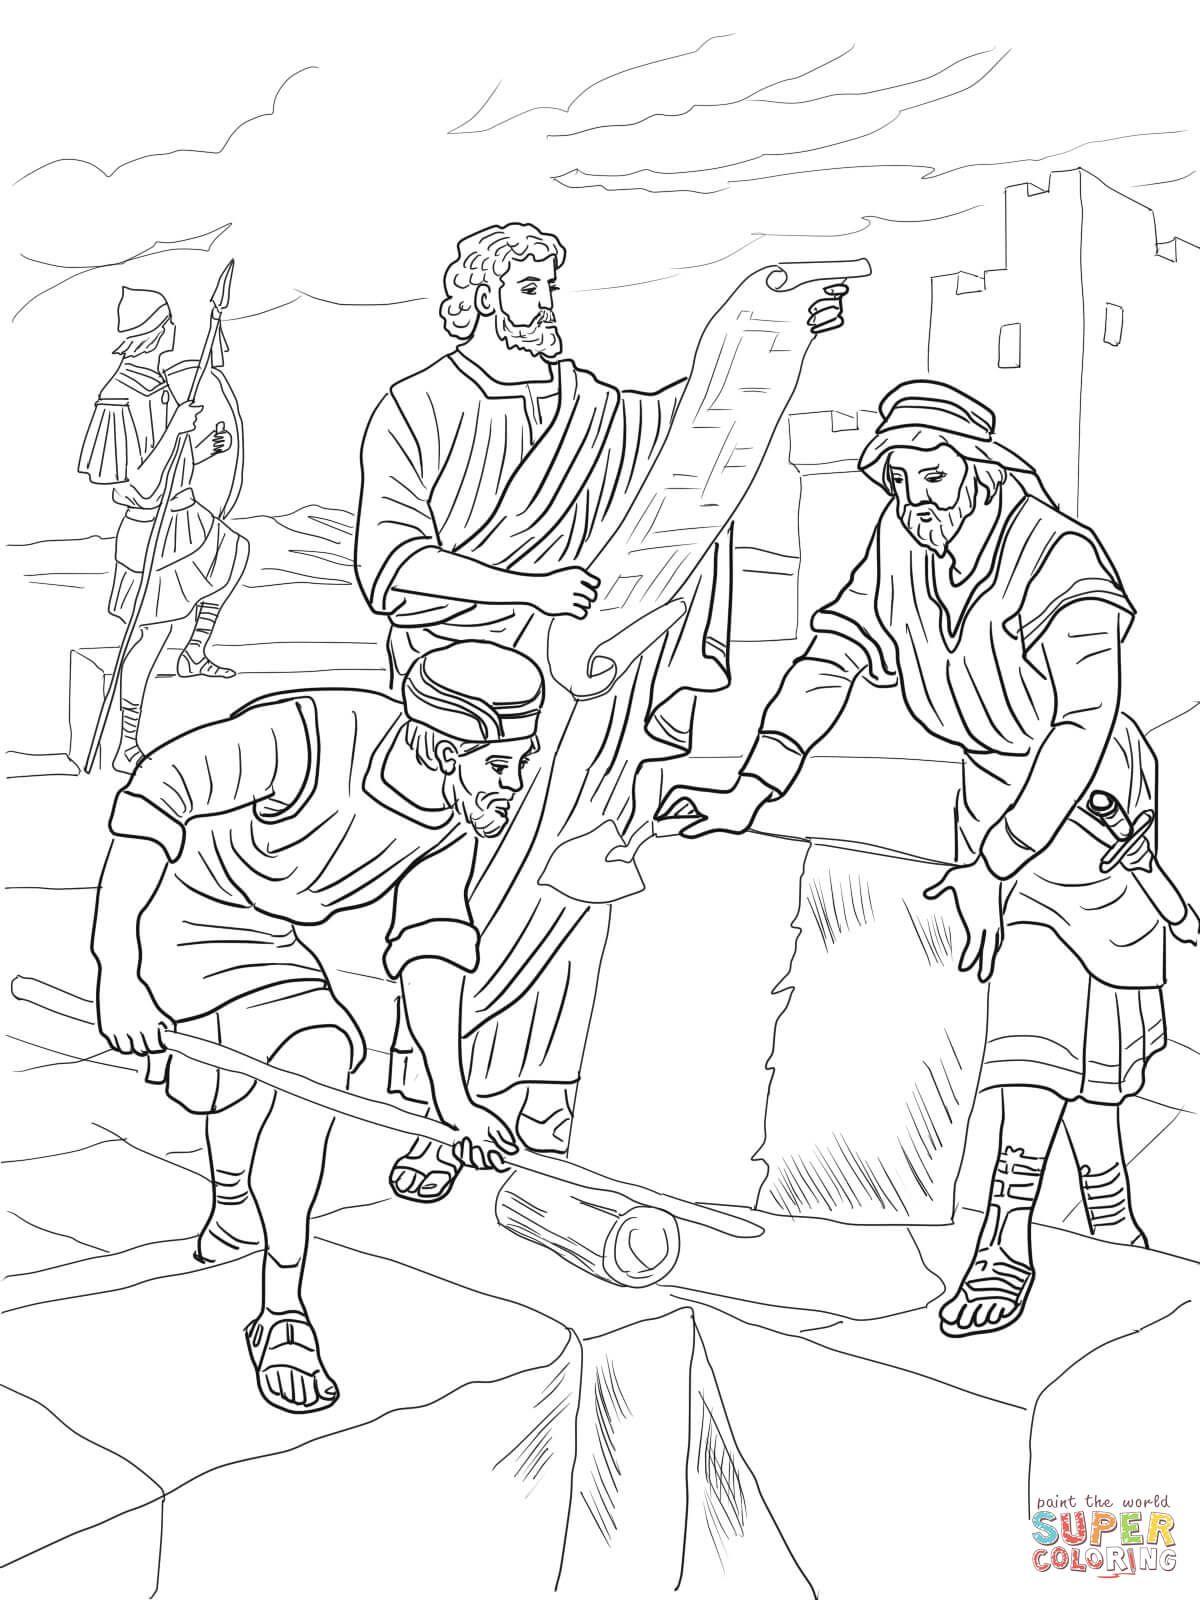 Nehemiah Wall Coloring Page | Sunday School Make & Takes | Pinterest